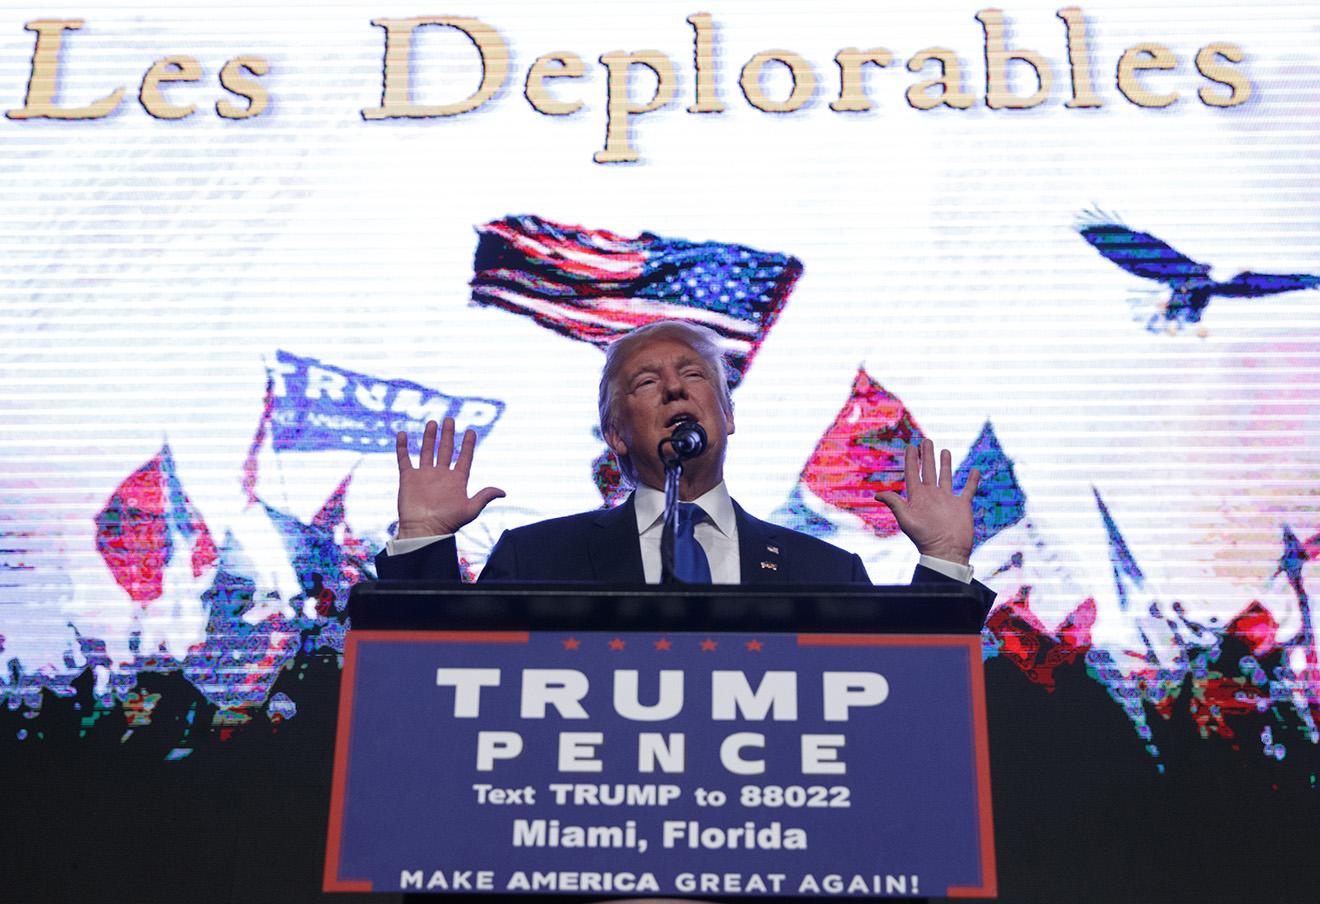 Дональд Трамп. Фото: Evan Vucci / AP